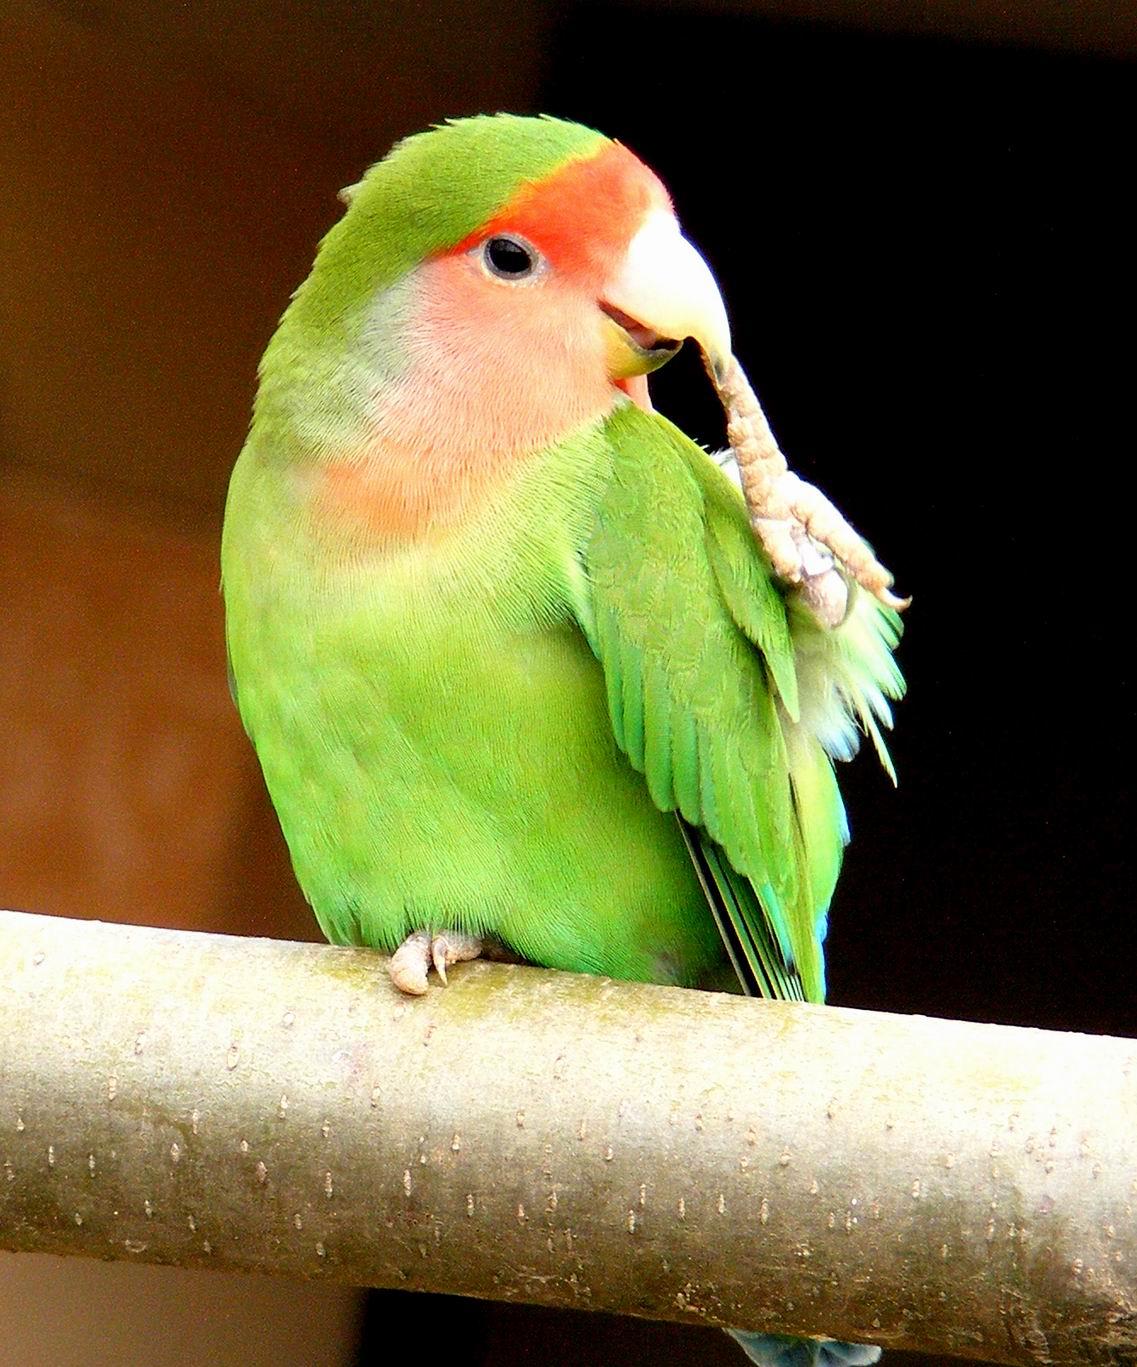 Розовощекий неразлучник . Парк птиц 'Воробьи'